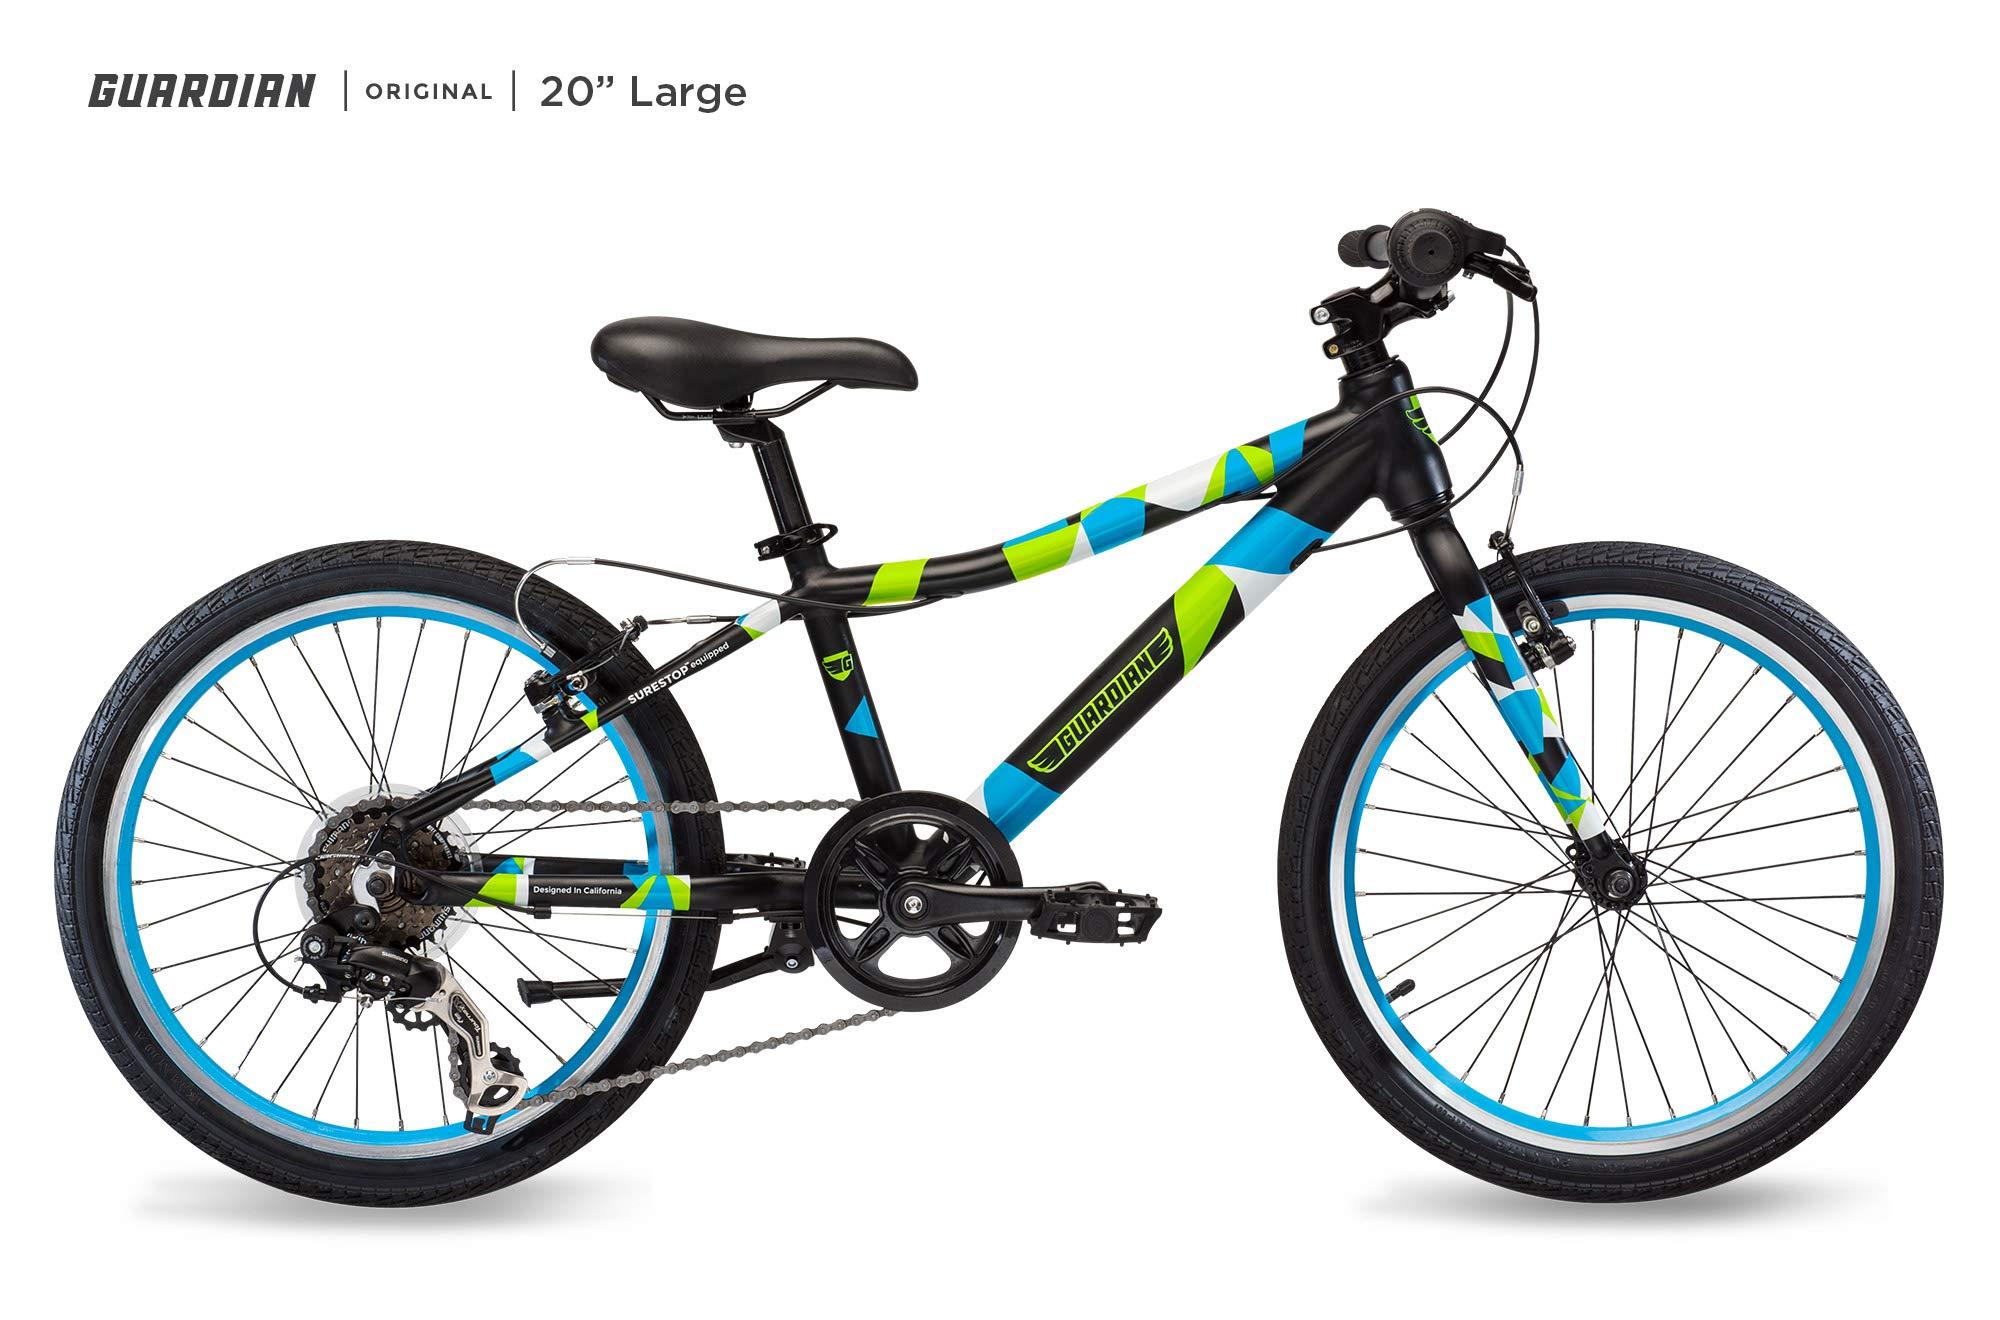 Guardian Kids Bikes Original. 16/20/24 Inch, Multiple Colors for Boys/Girls. Safer Brake System for Kids. Lightweight Aluminum Construction. Easy Assembly. ASO SharkTank. product image